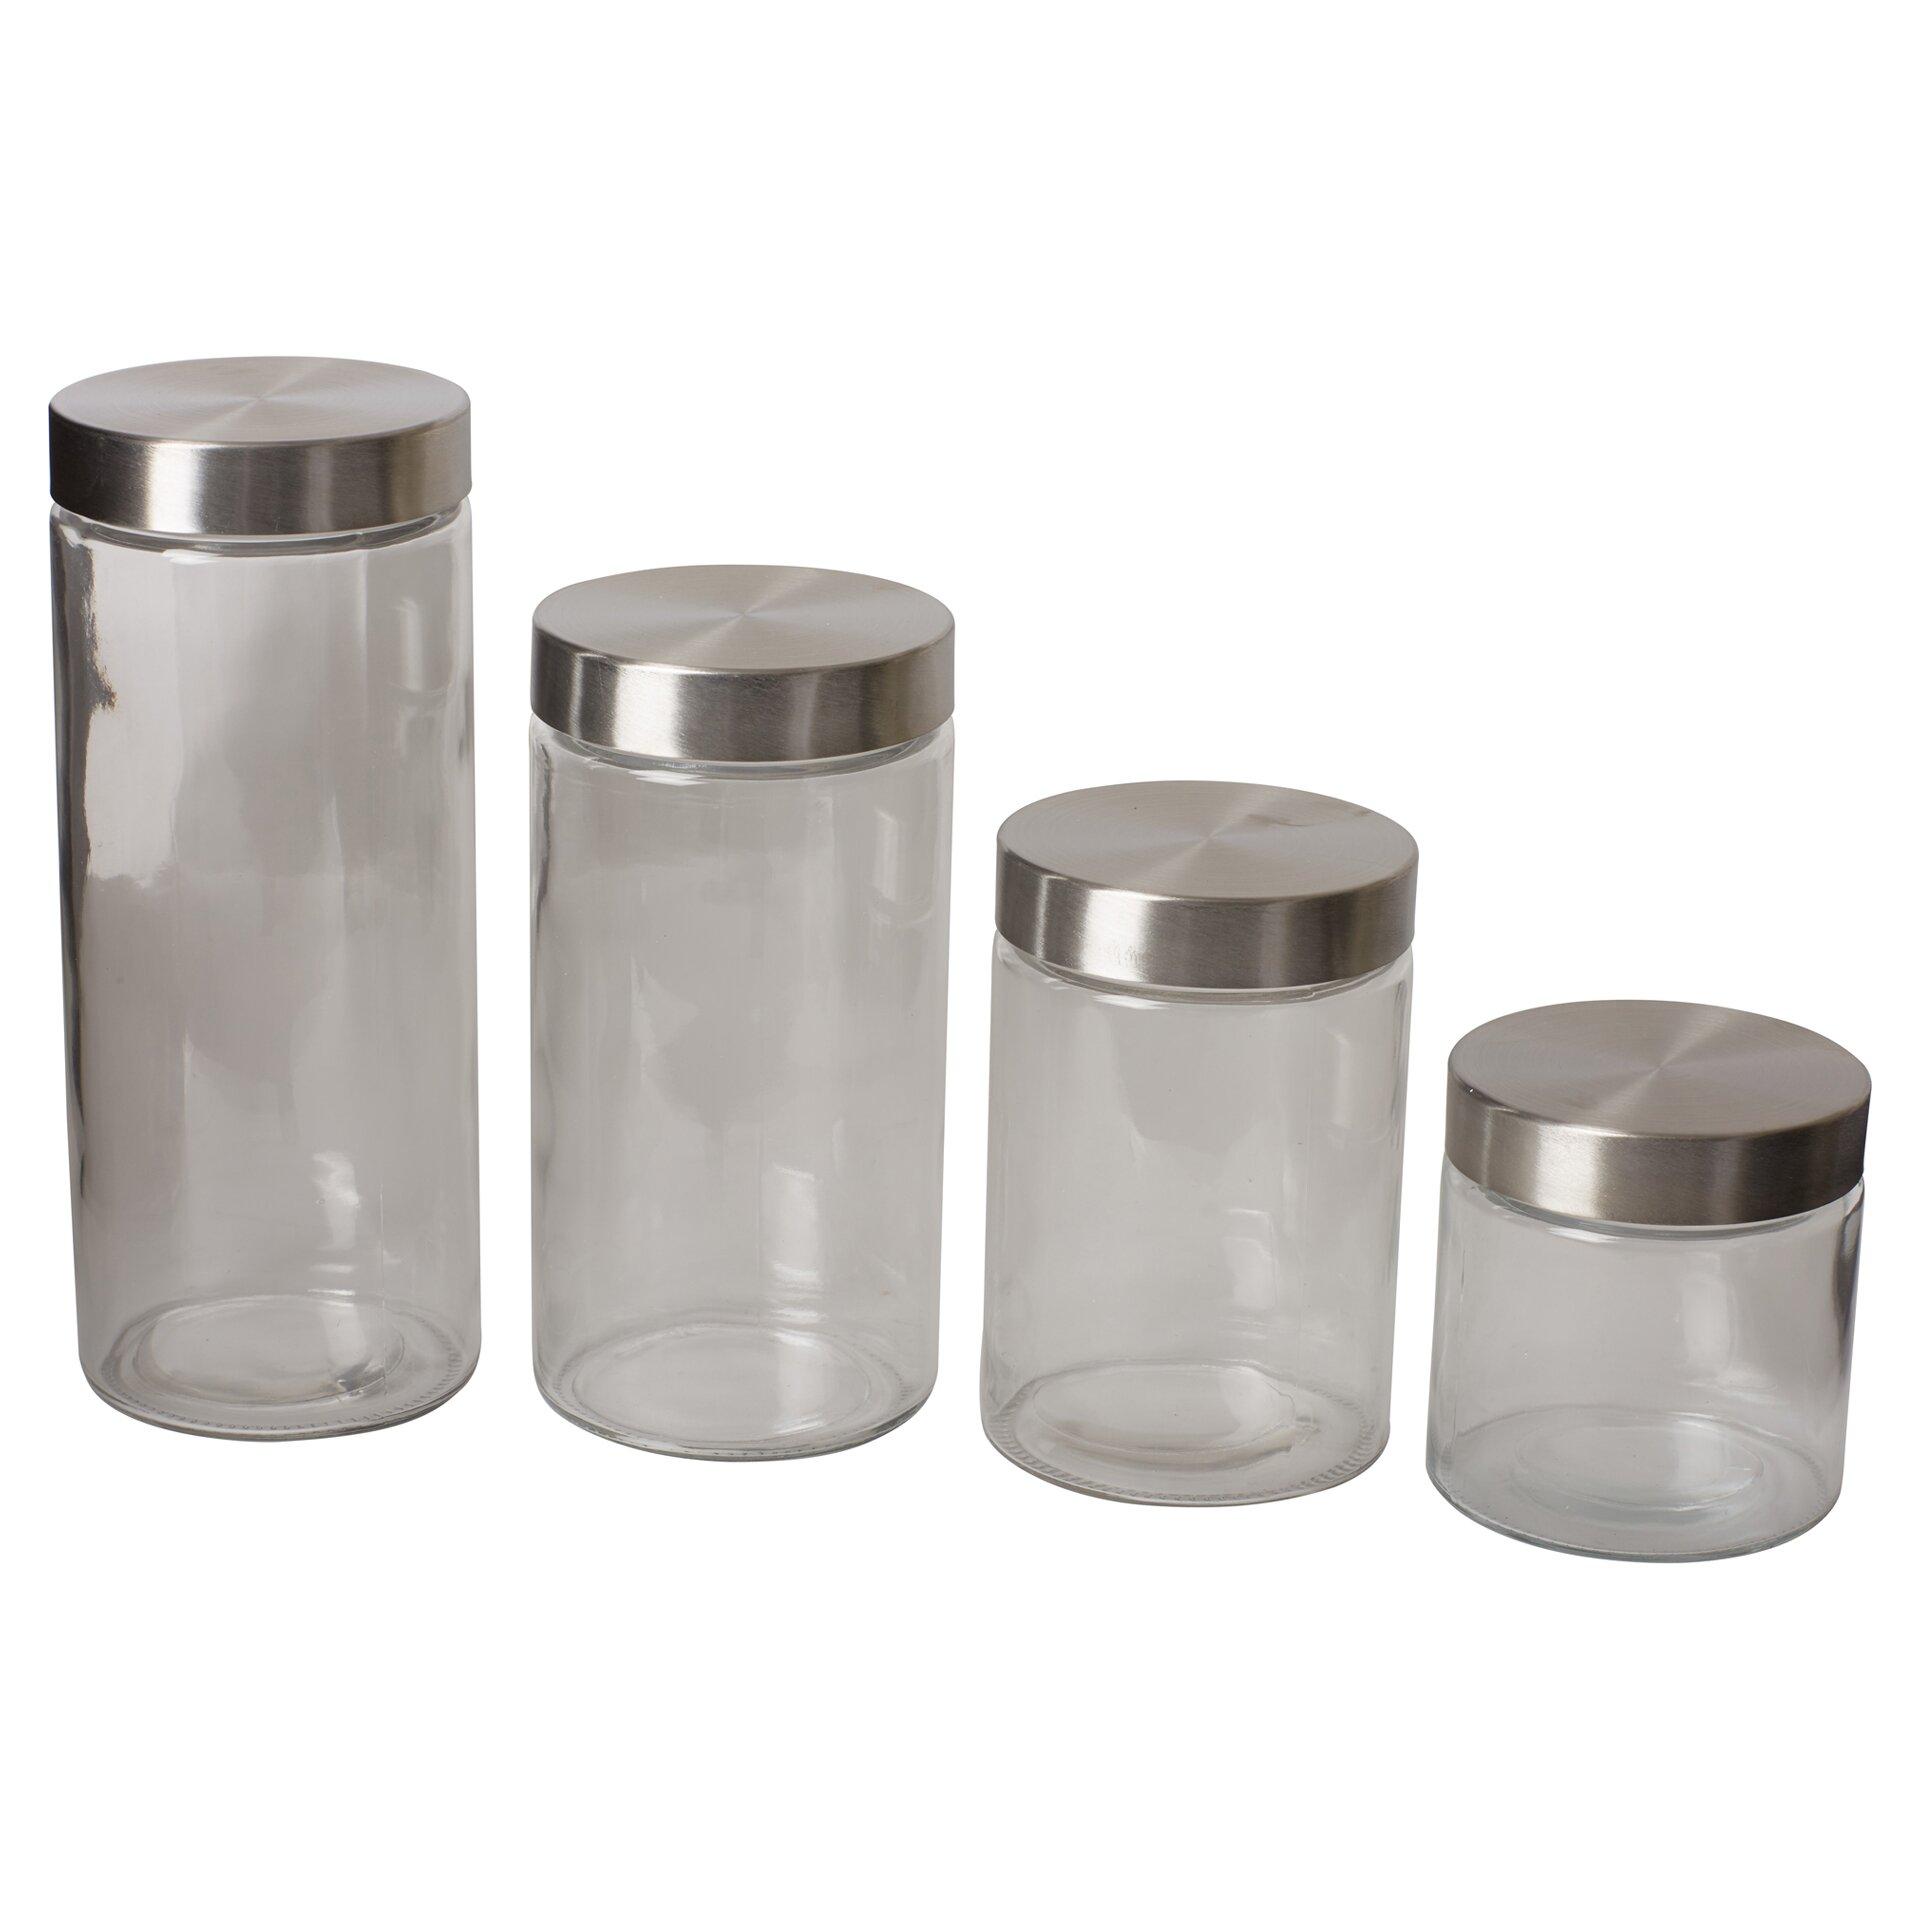 28 4 piece kitchen canister sets vintage kitchen canisters 4 piece kitchen canister sets wayfair basics wayfair basics 4 piece kitchen canister